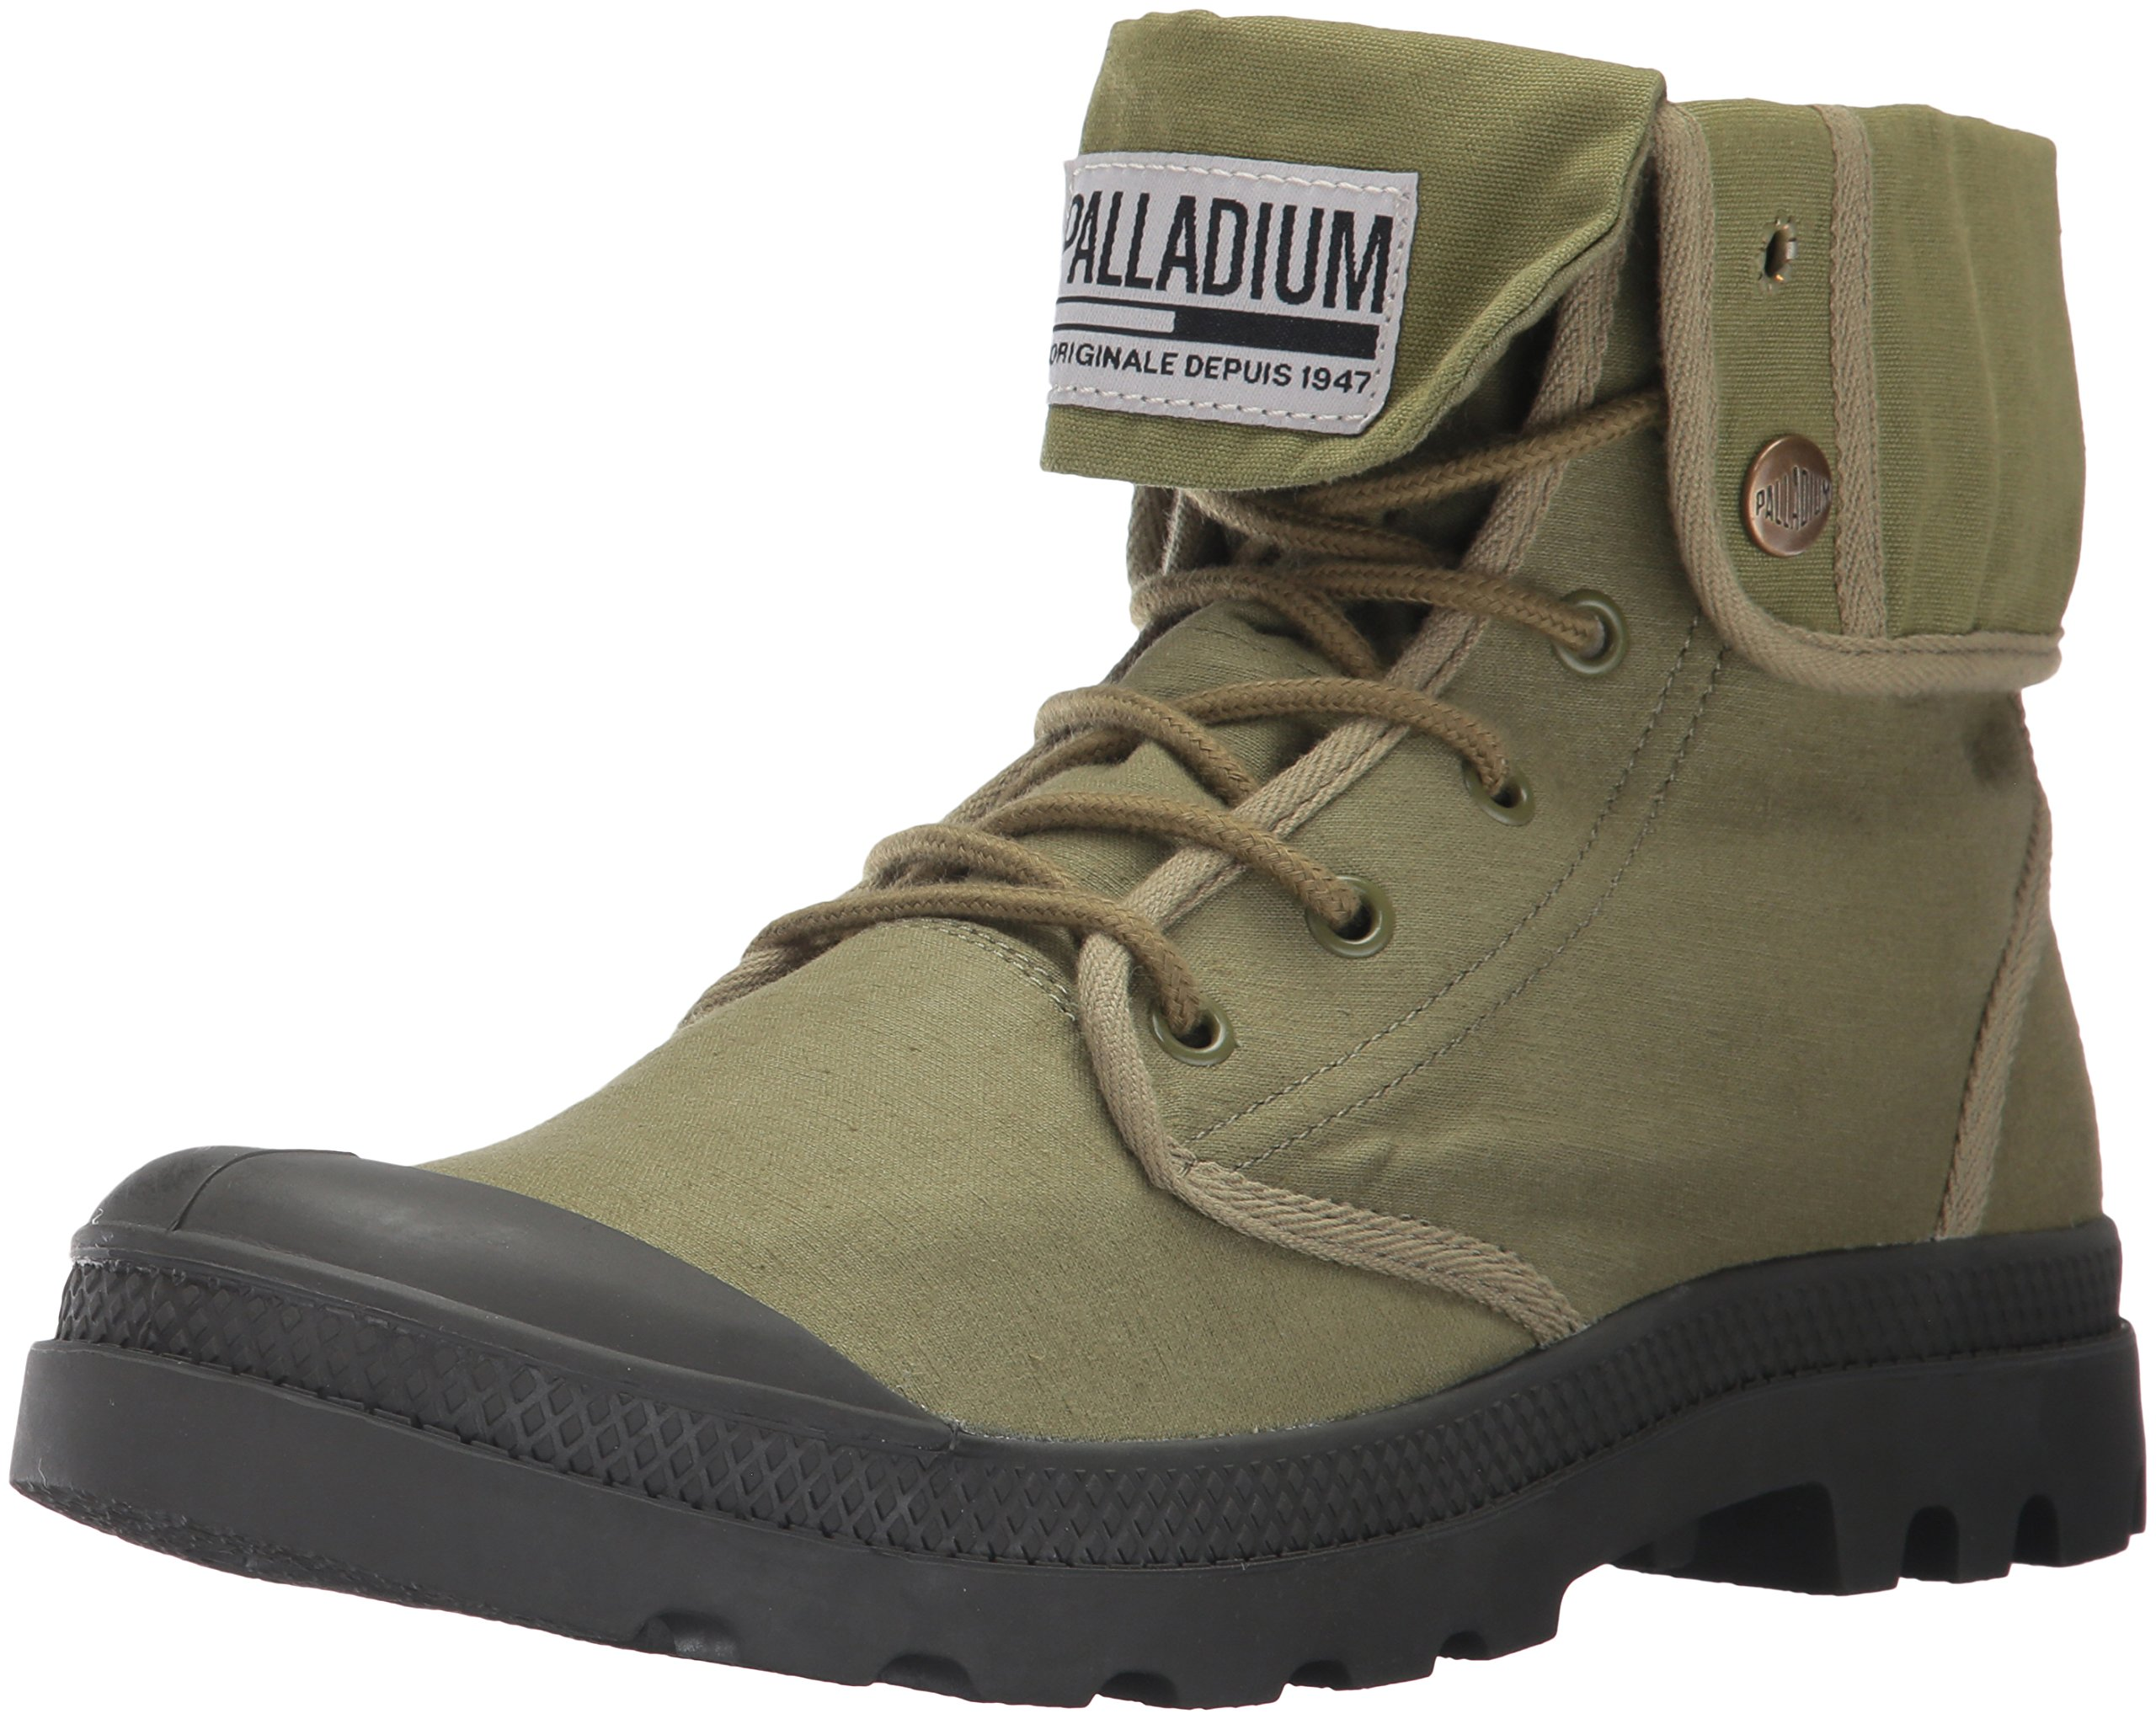 Palladium Men's Baggy Army Trng Camp Chukka Boot, Olive Drab/Beluga, 5 M US